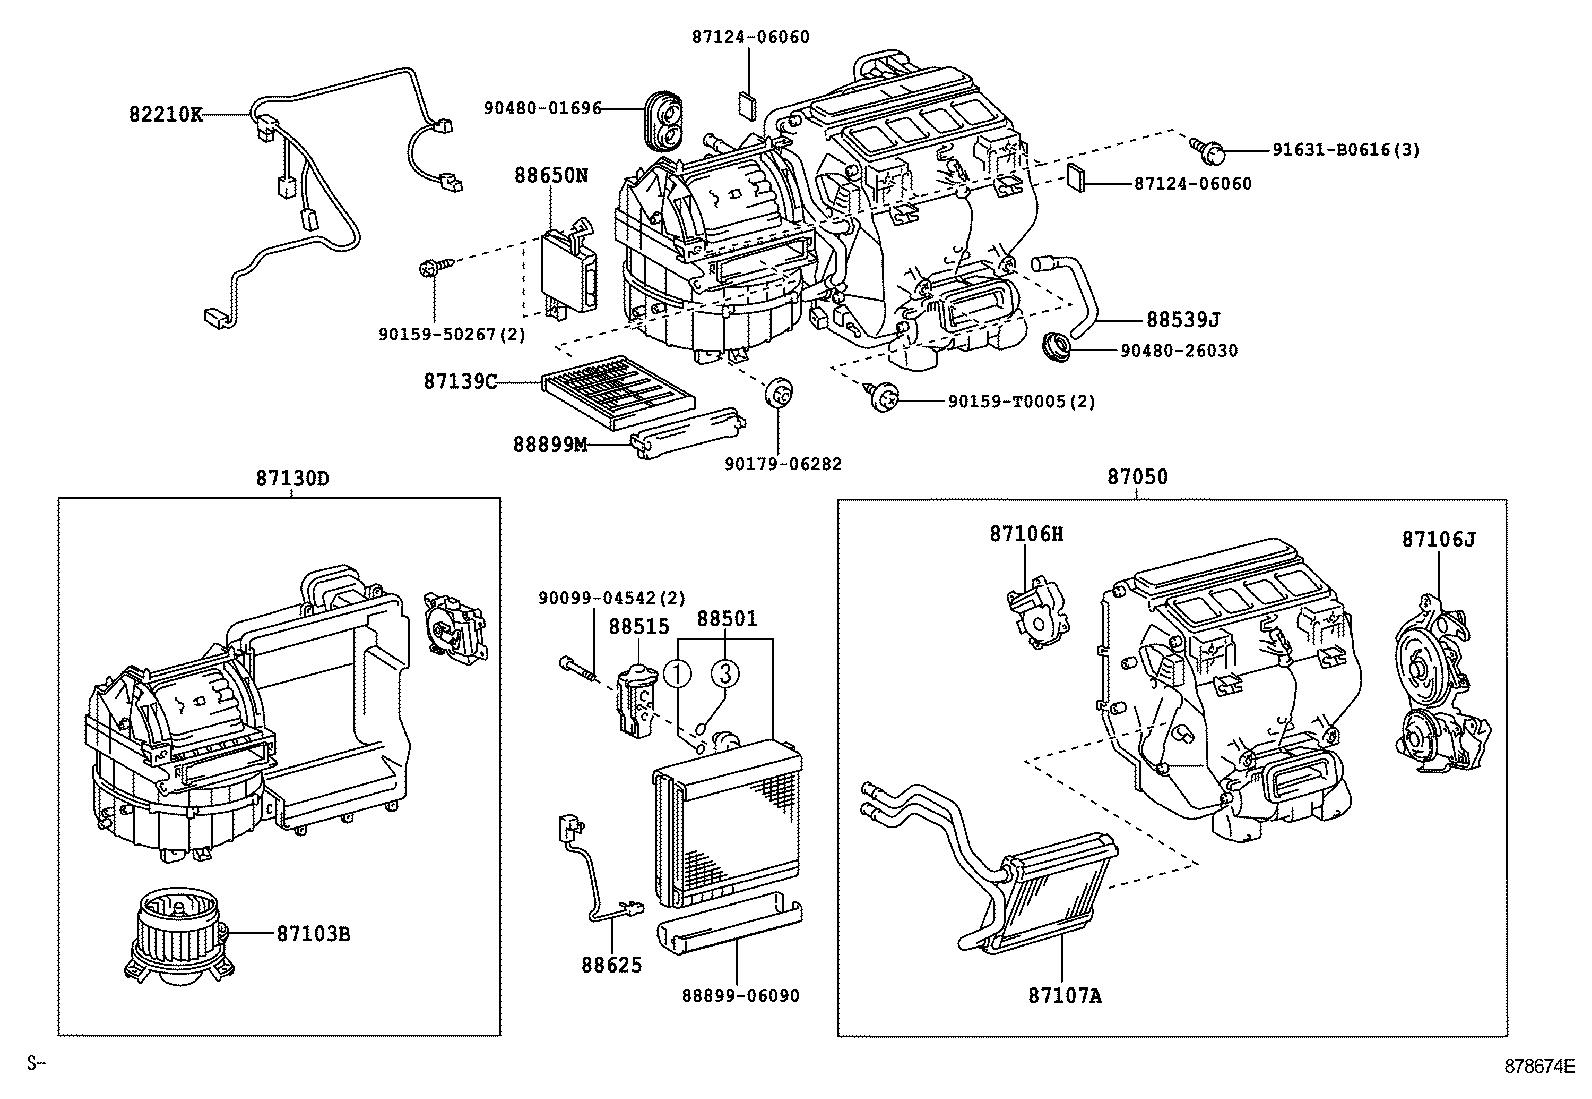 toyota camry hybridacv41r-jepnke - electrical